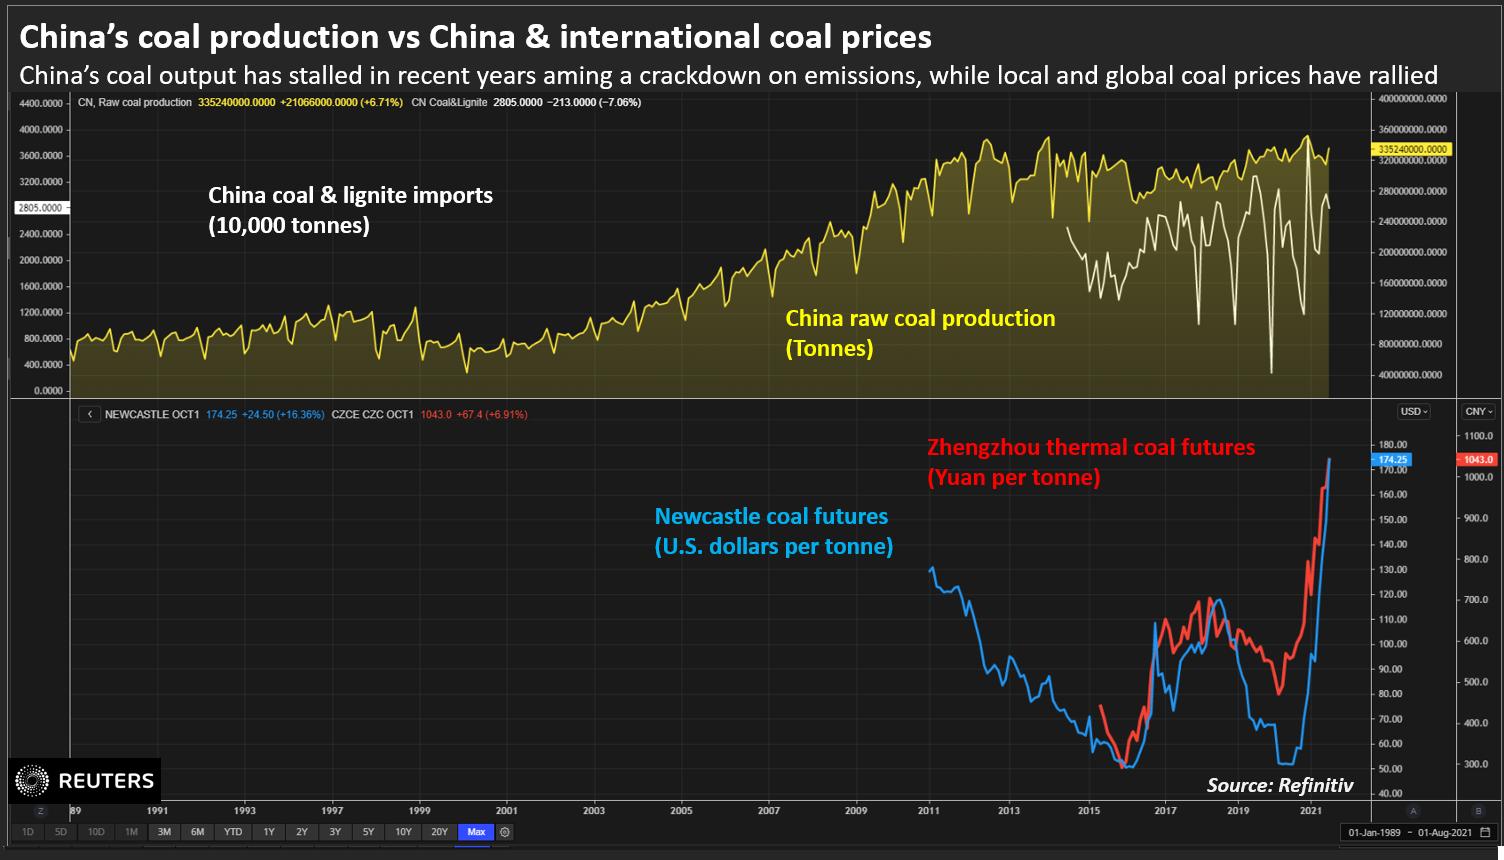 China's coal production vs China & international coal prices